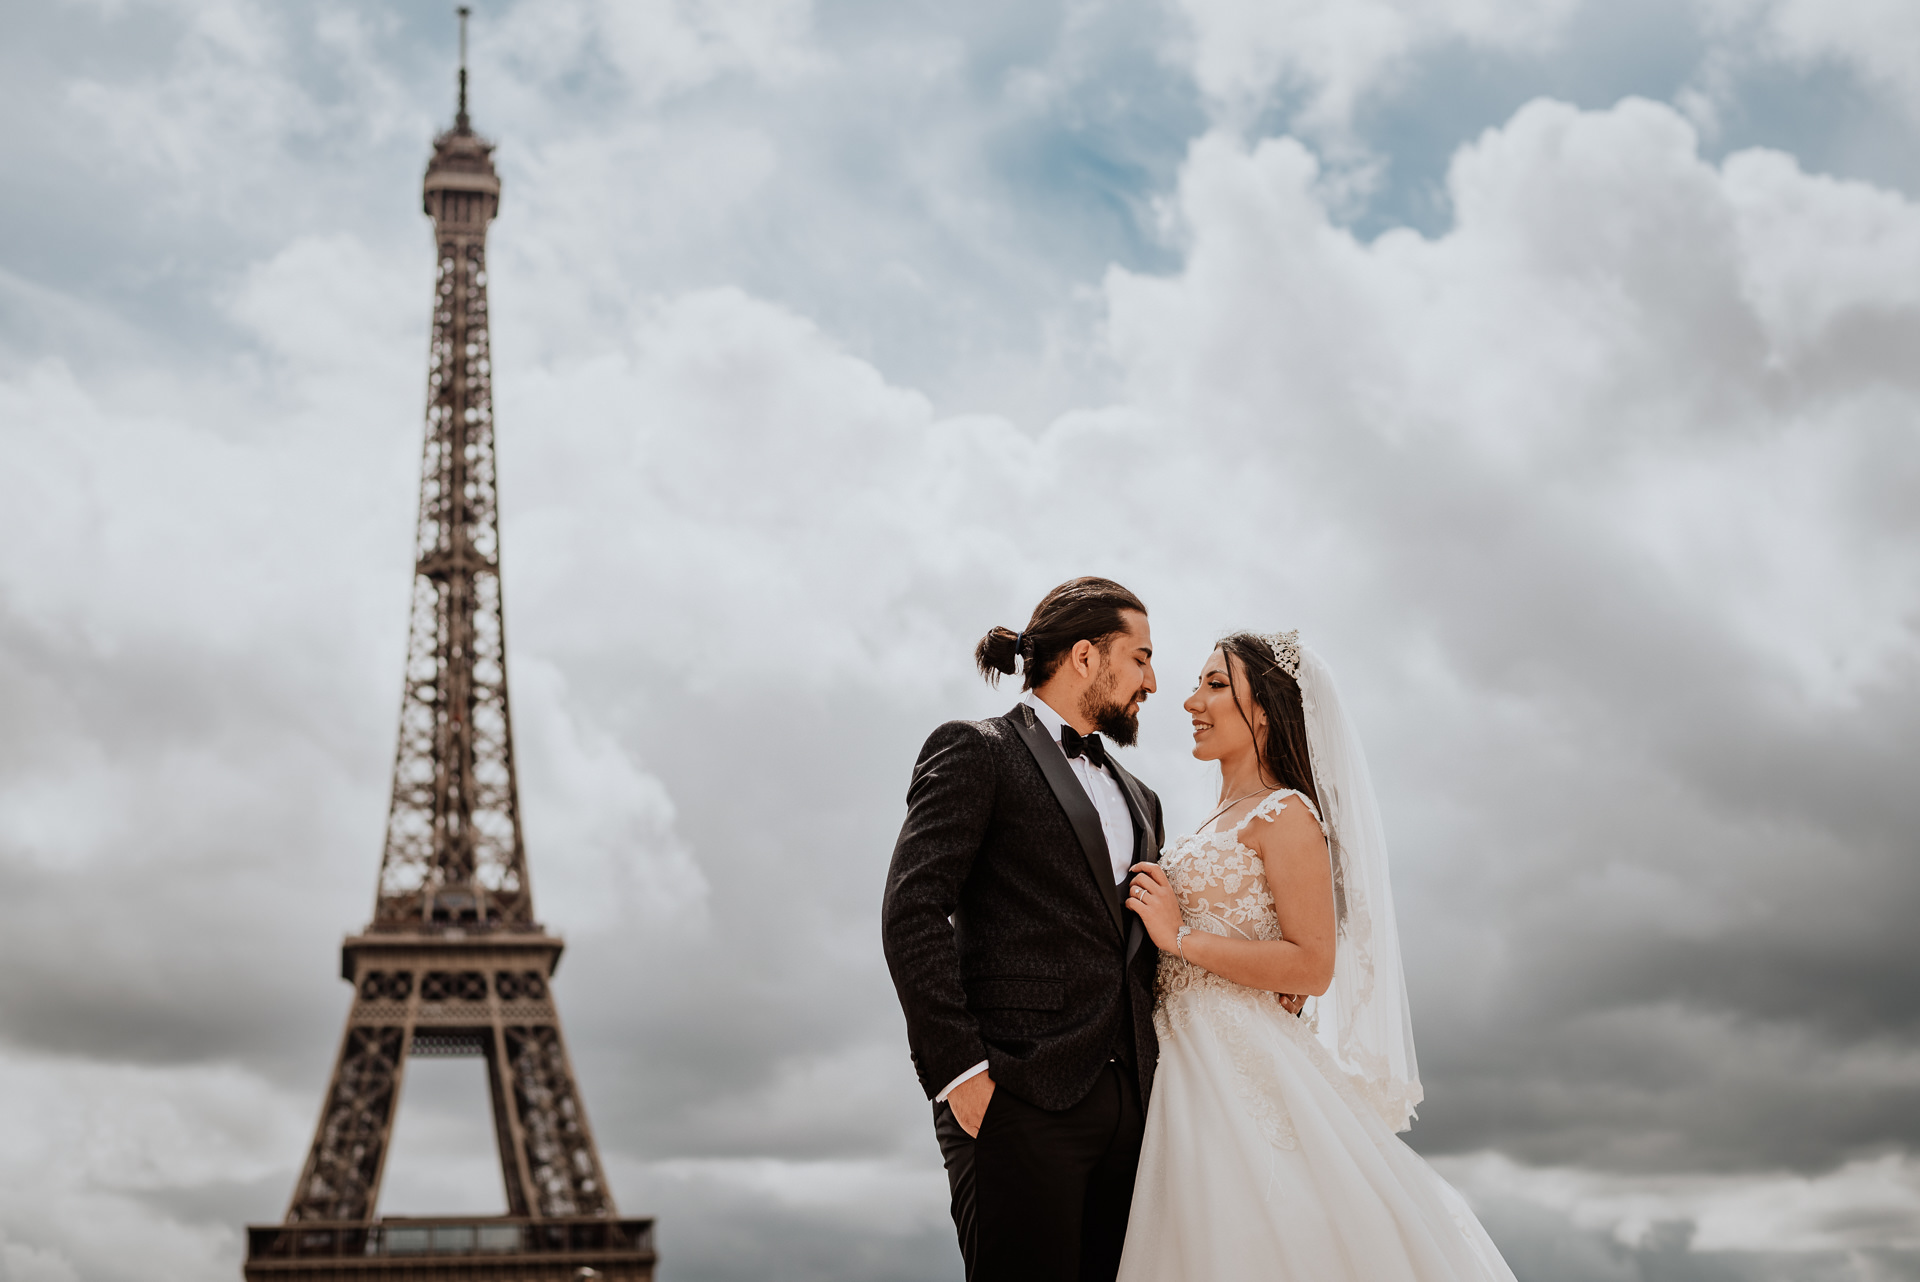 PAris elopement wedding photoshoot